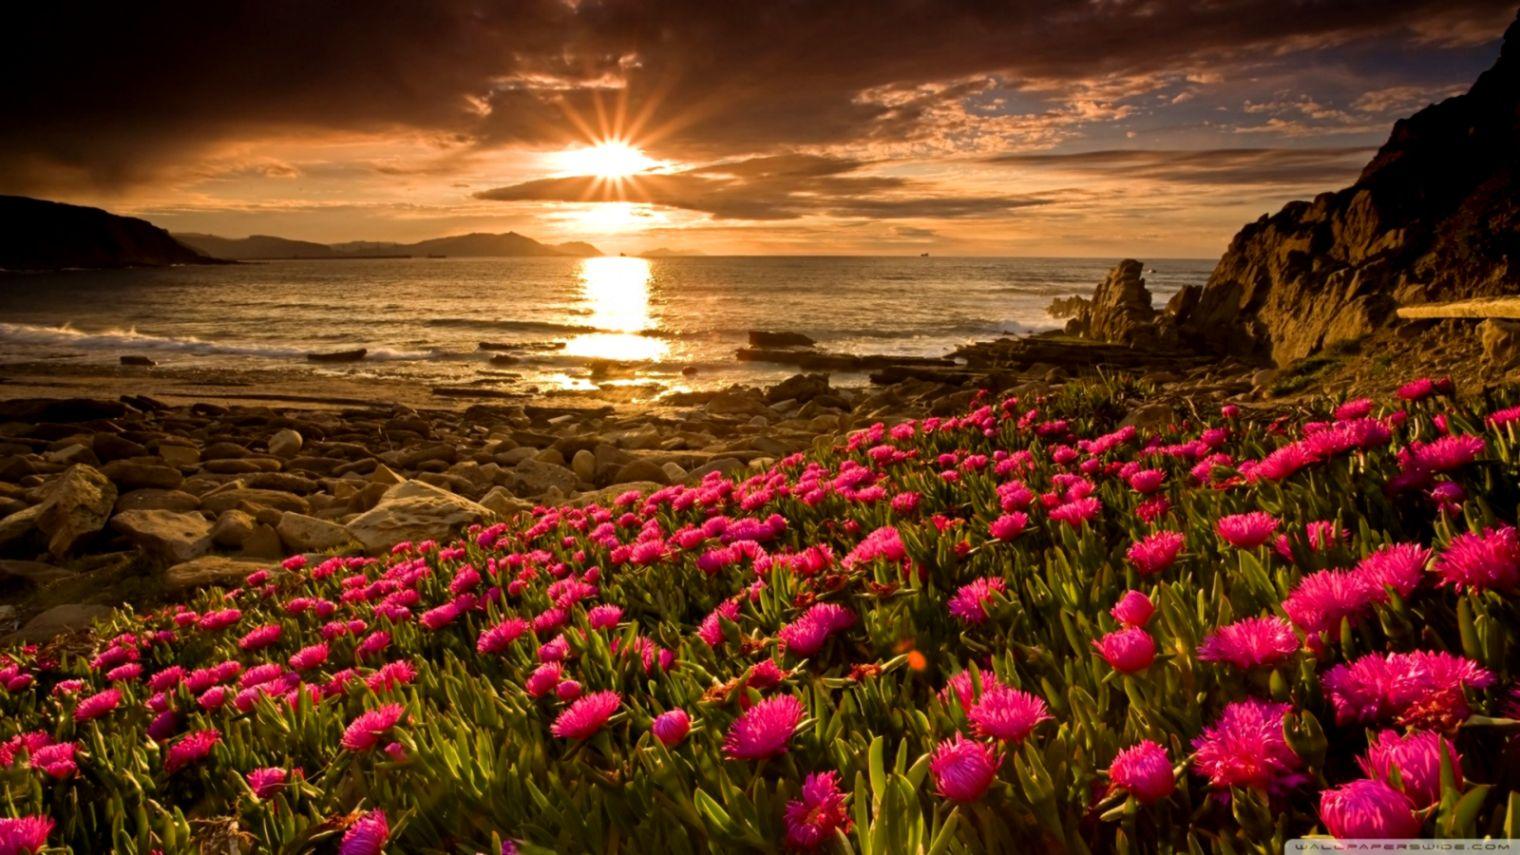 Free Download Beach Flowers 4k Hd Desktop Wallpaper For 4k Ultra Flowers 1520x855 For Your Desktop Mobile Tablet Explore 59 Flowers Images Desktop Backgrounds Background Flowers Images Flowers Wallpaper